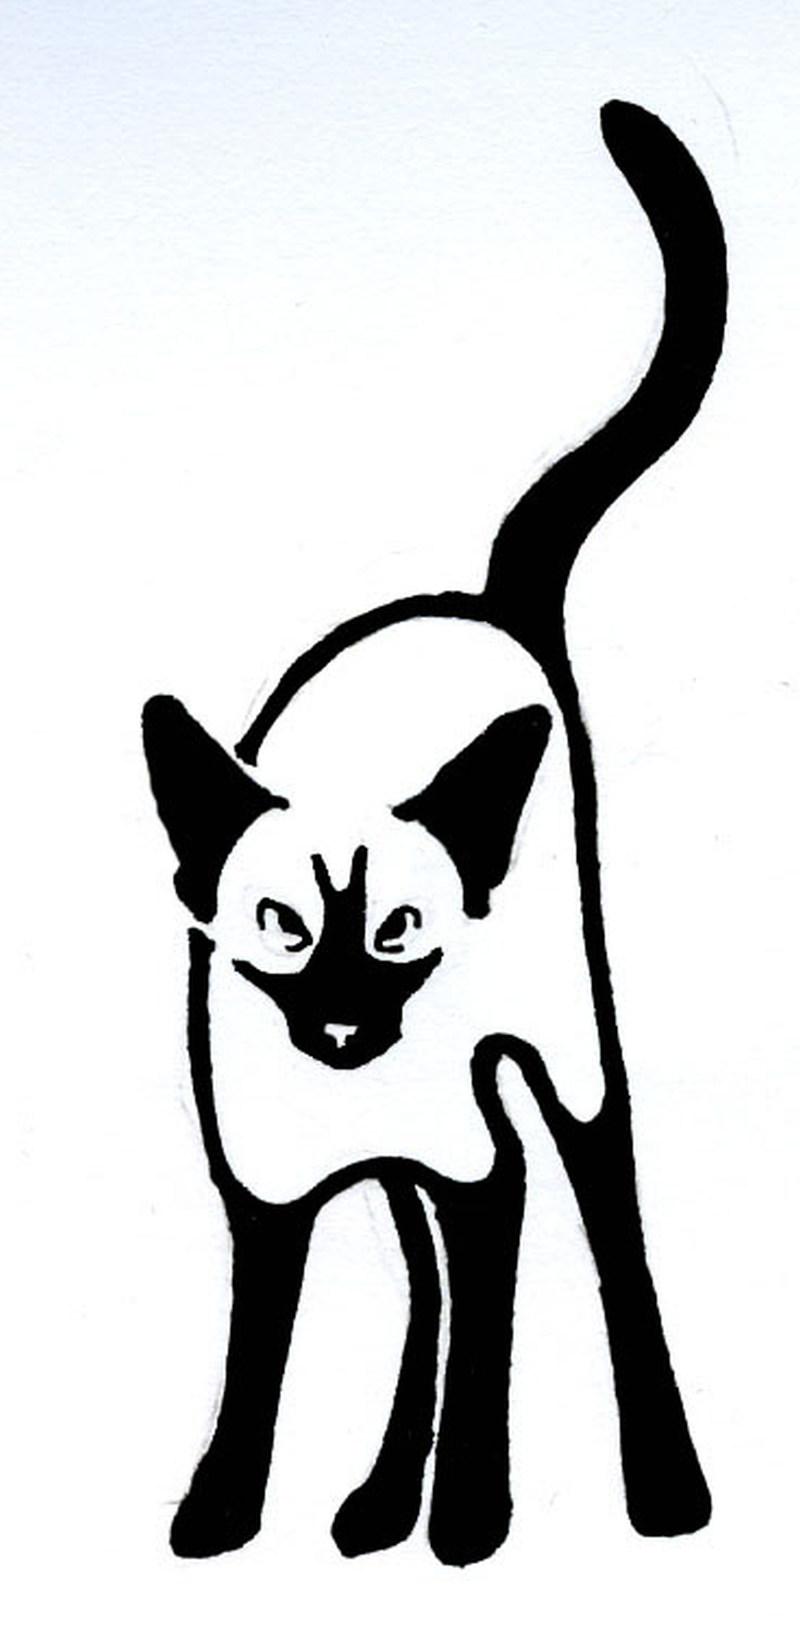 Superb cat tattoo design